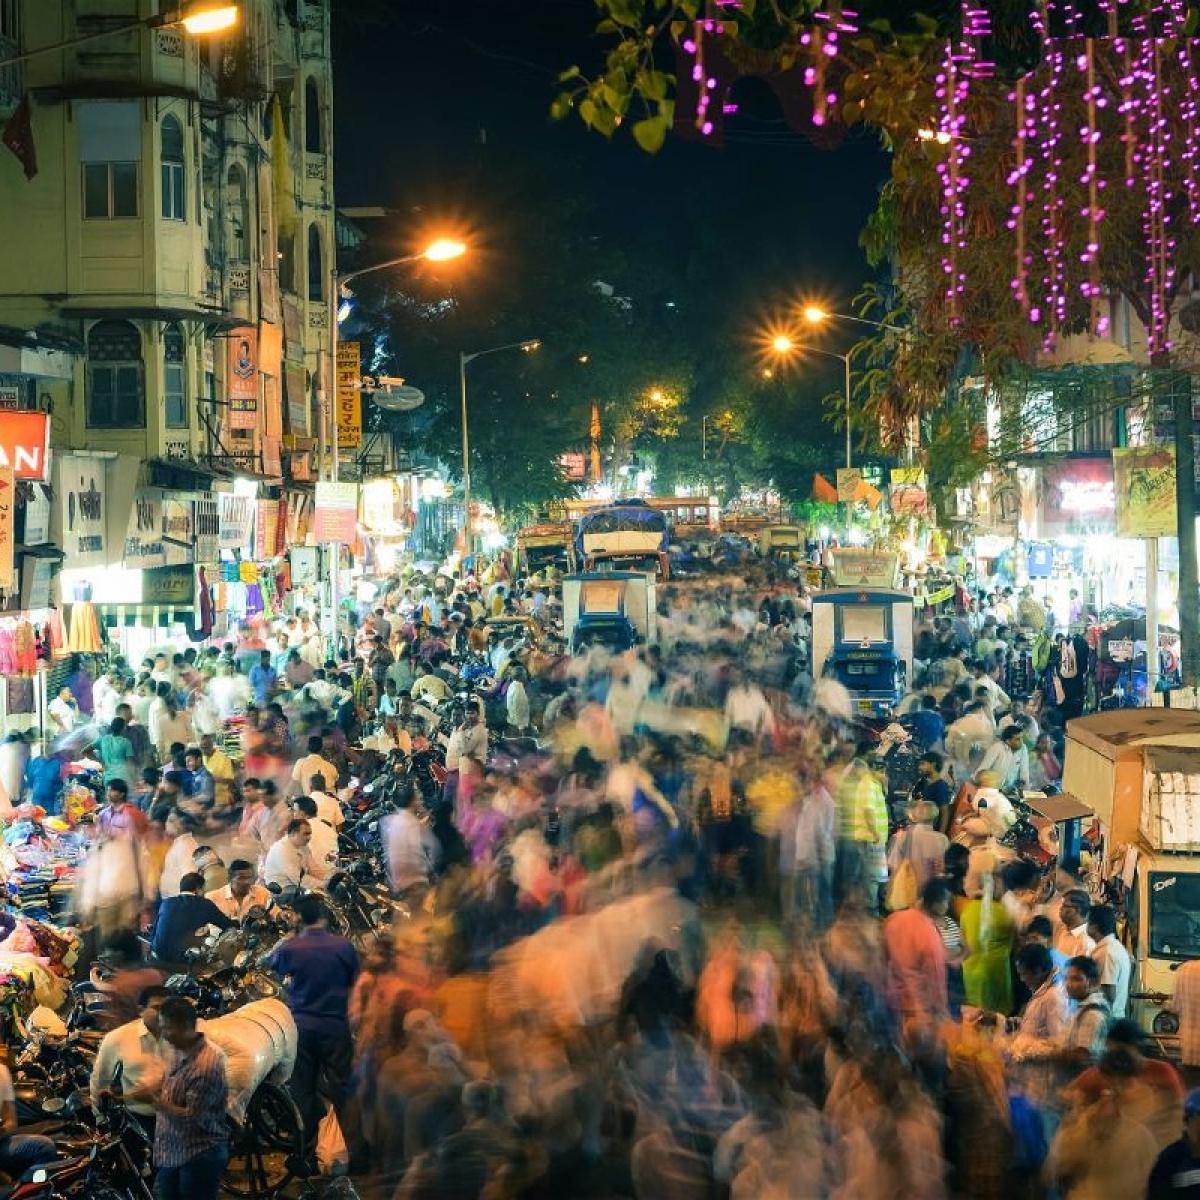 Nightlife in Mumbai: Now, 'the Maximum City' tag will truly make sense Restaurateur